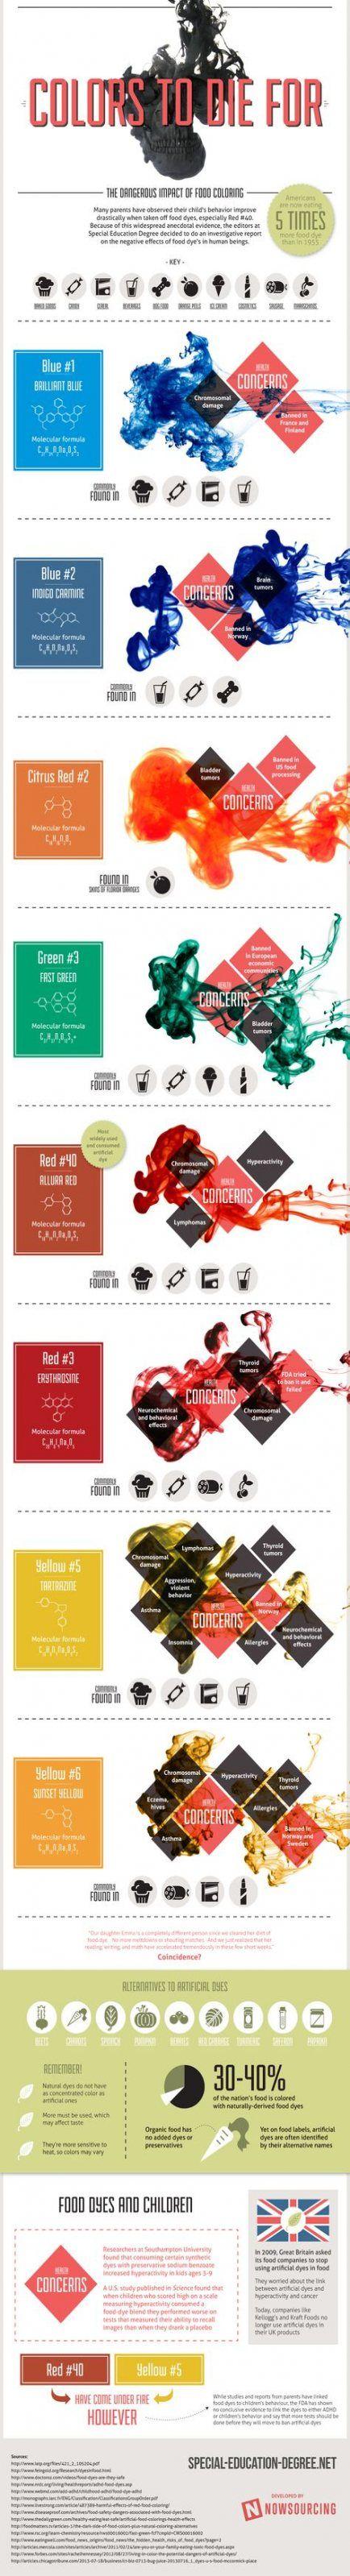 25 Trendy Design Food Link Food Dye Artificial Food Coloring Food Infographic